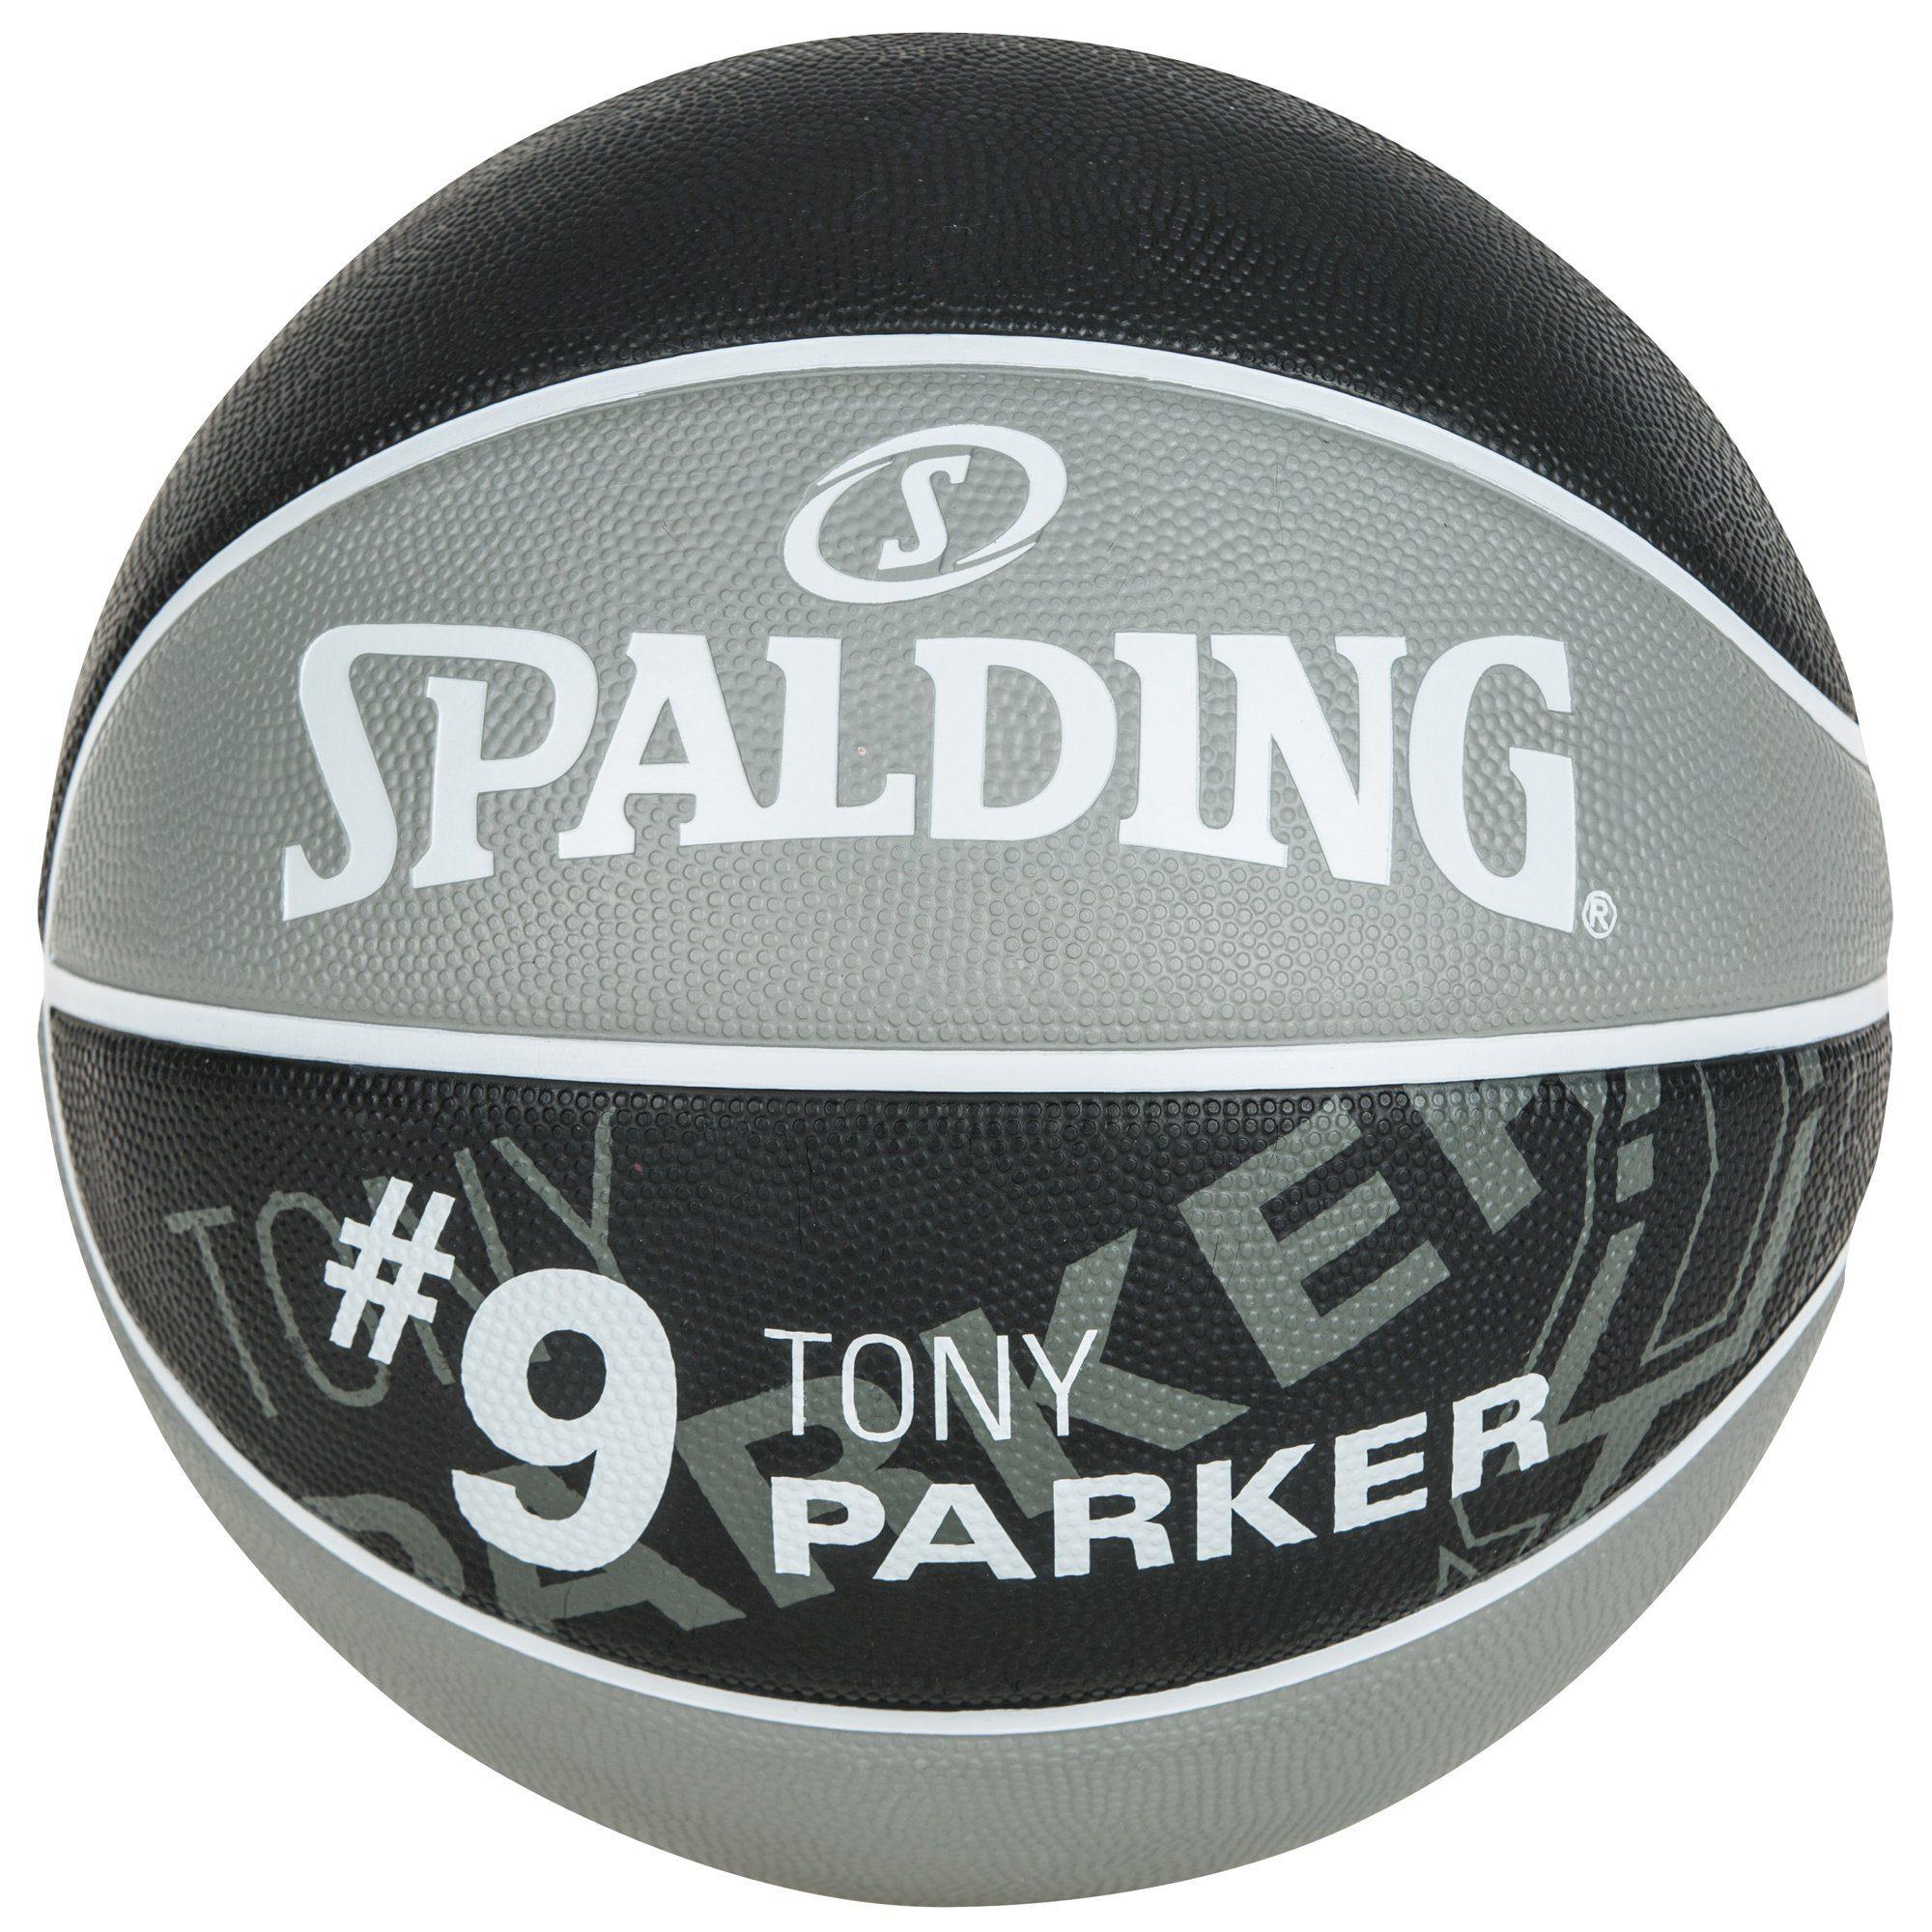 SPALDING NBA Player Tony Parker Basketball